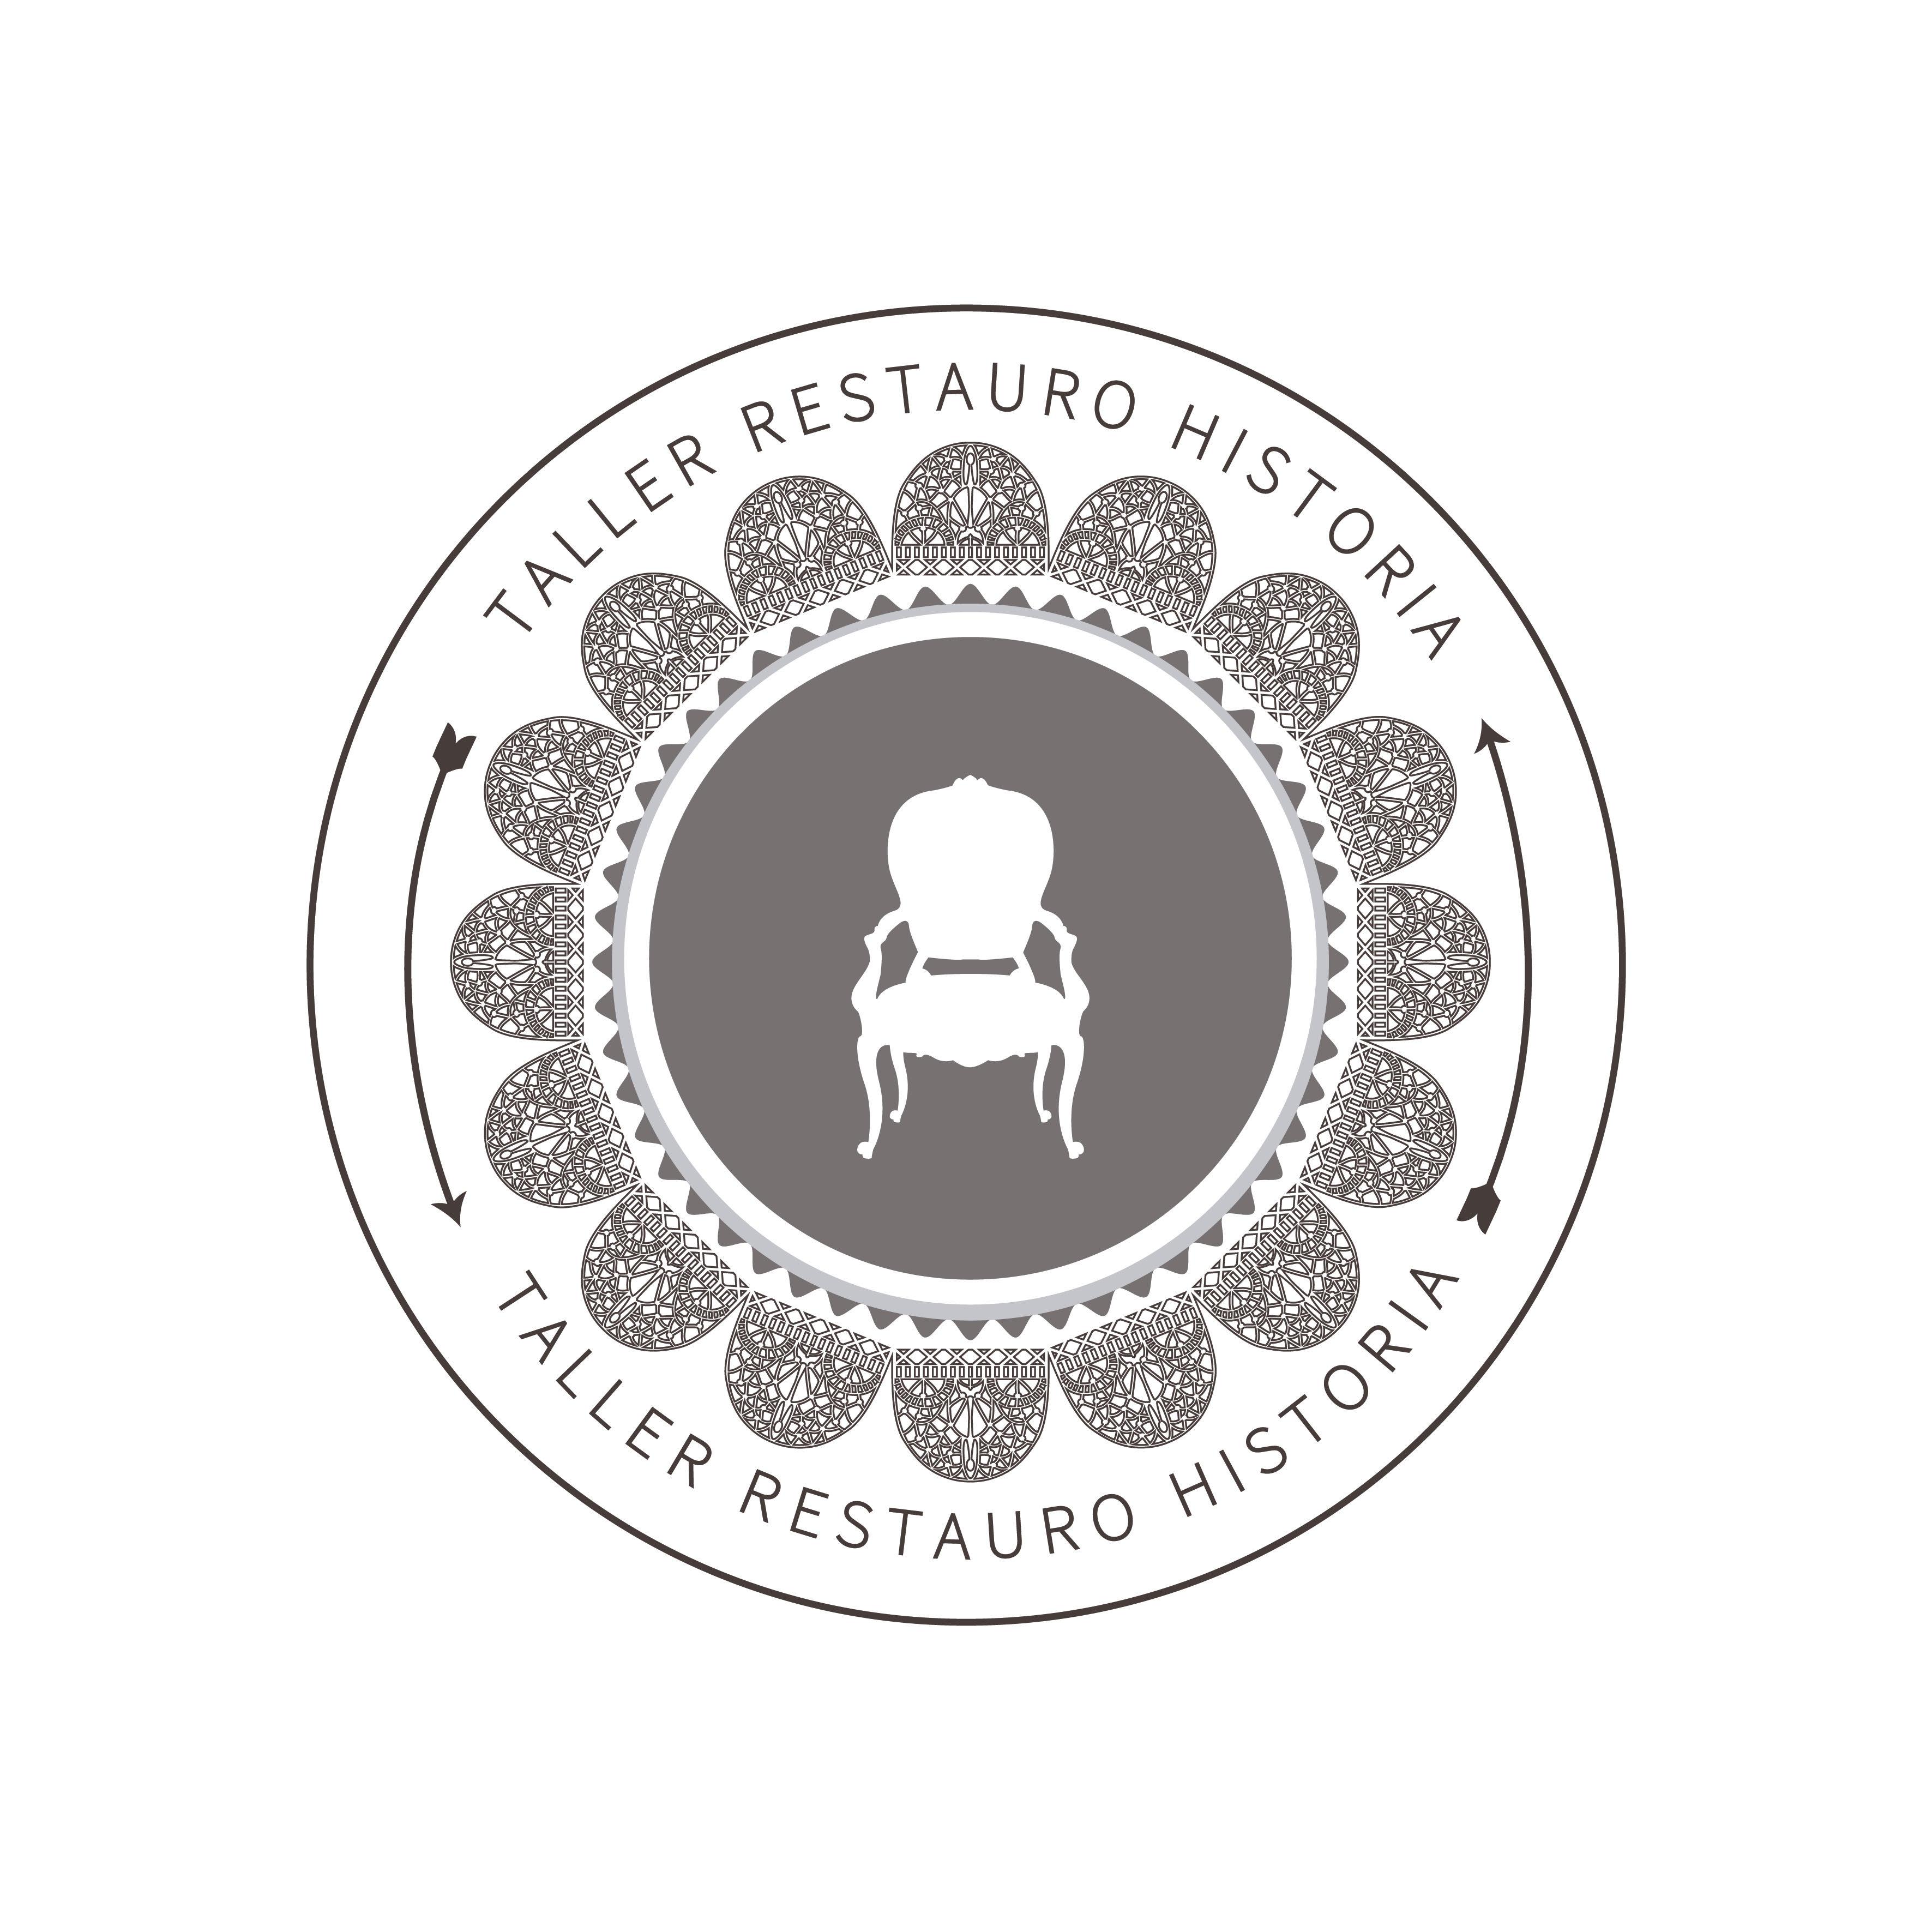 139 Taller Restauro Historia Logo 2